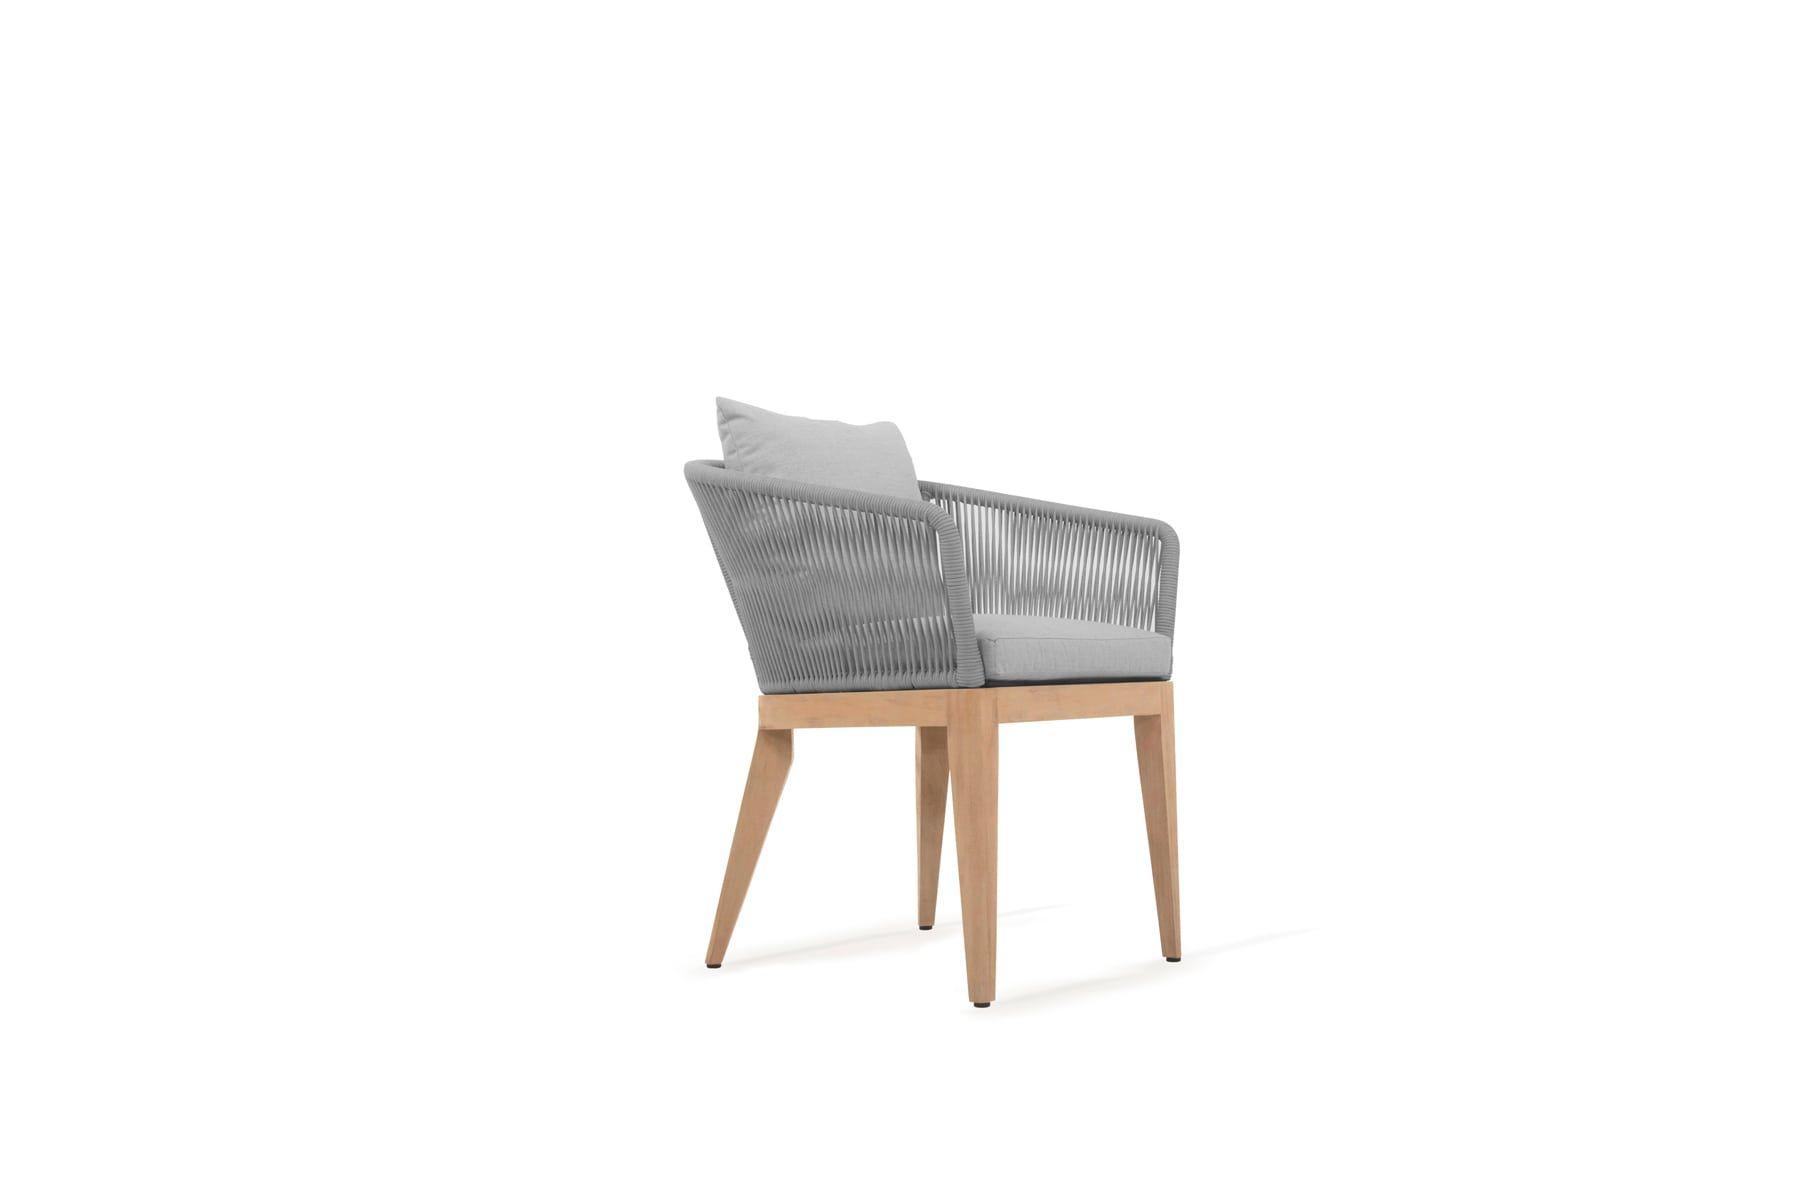 cerca le ultime autentica di fabbrica come serch Avalon dining chair in 2019 | outdoor | Outdoor dining ...